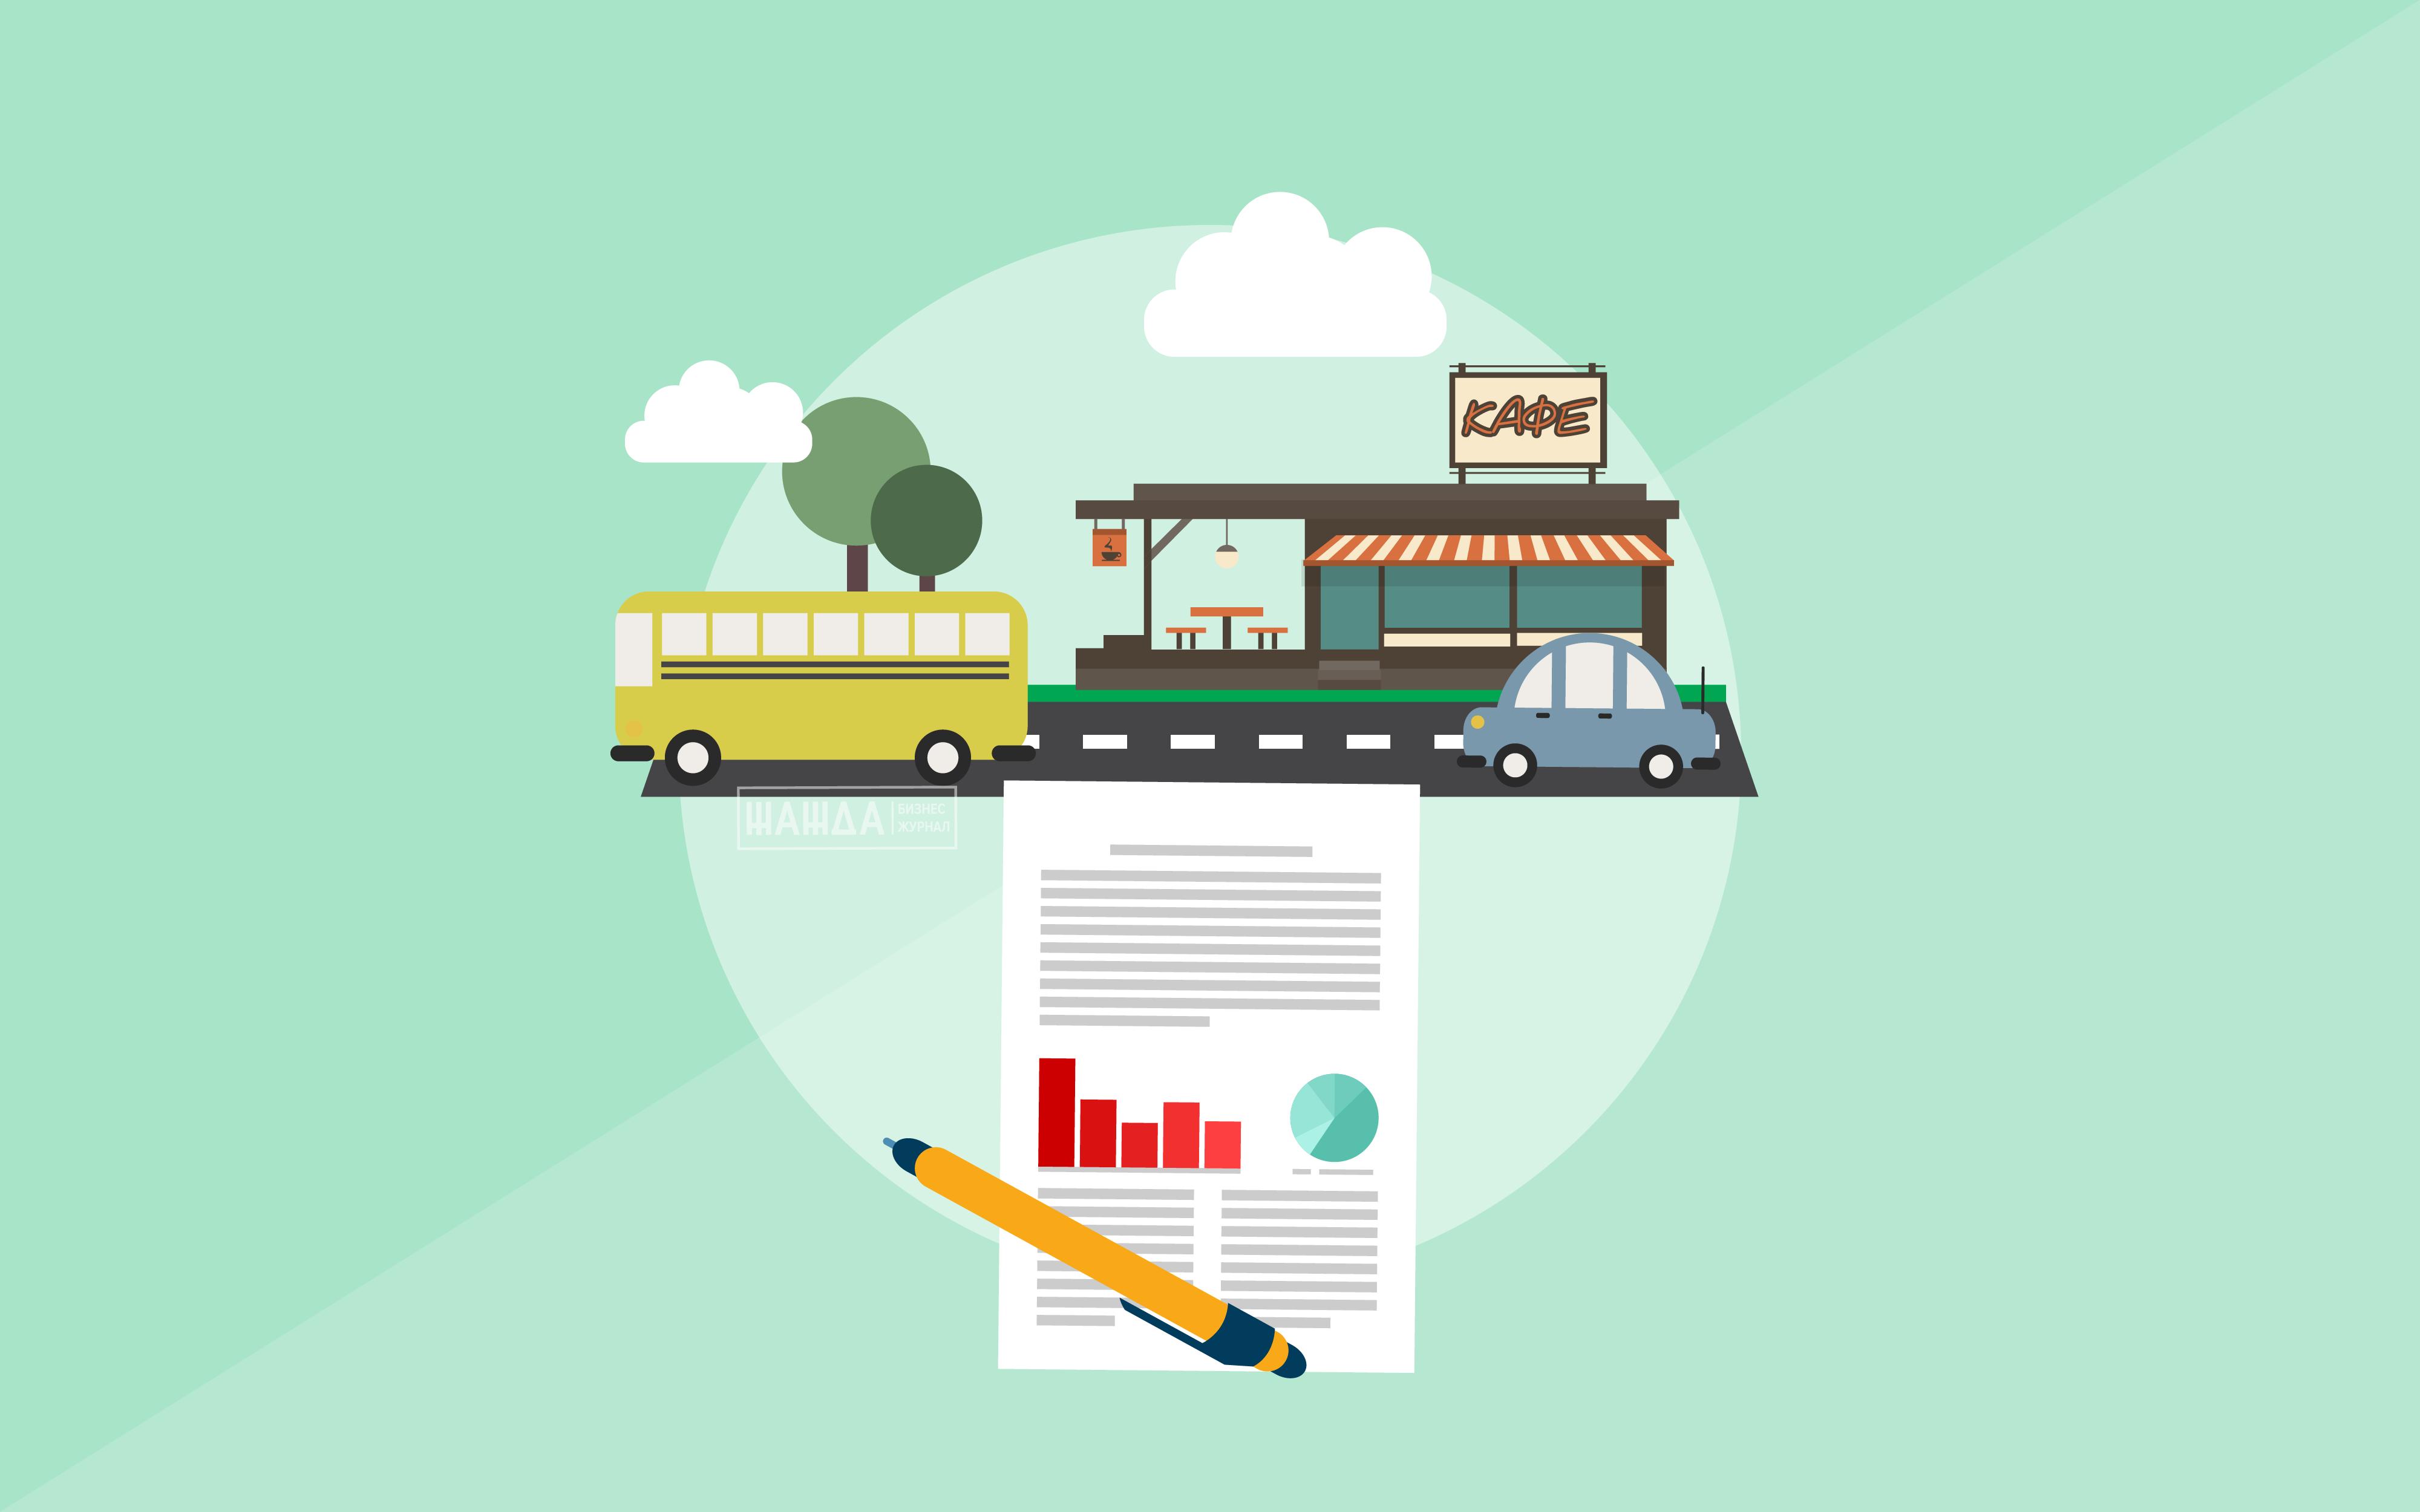 Бизнес план придорожные сервис бизнес план производства пескоблока